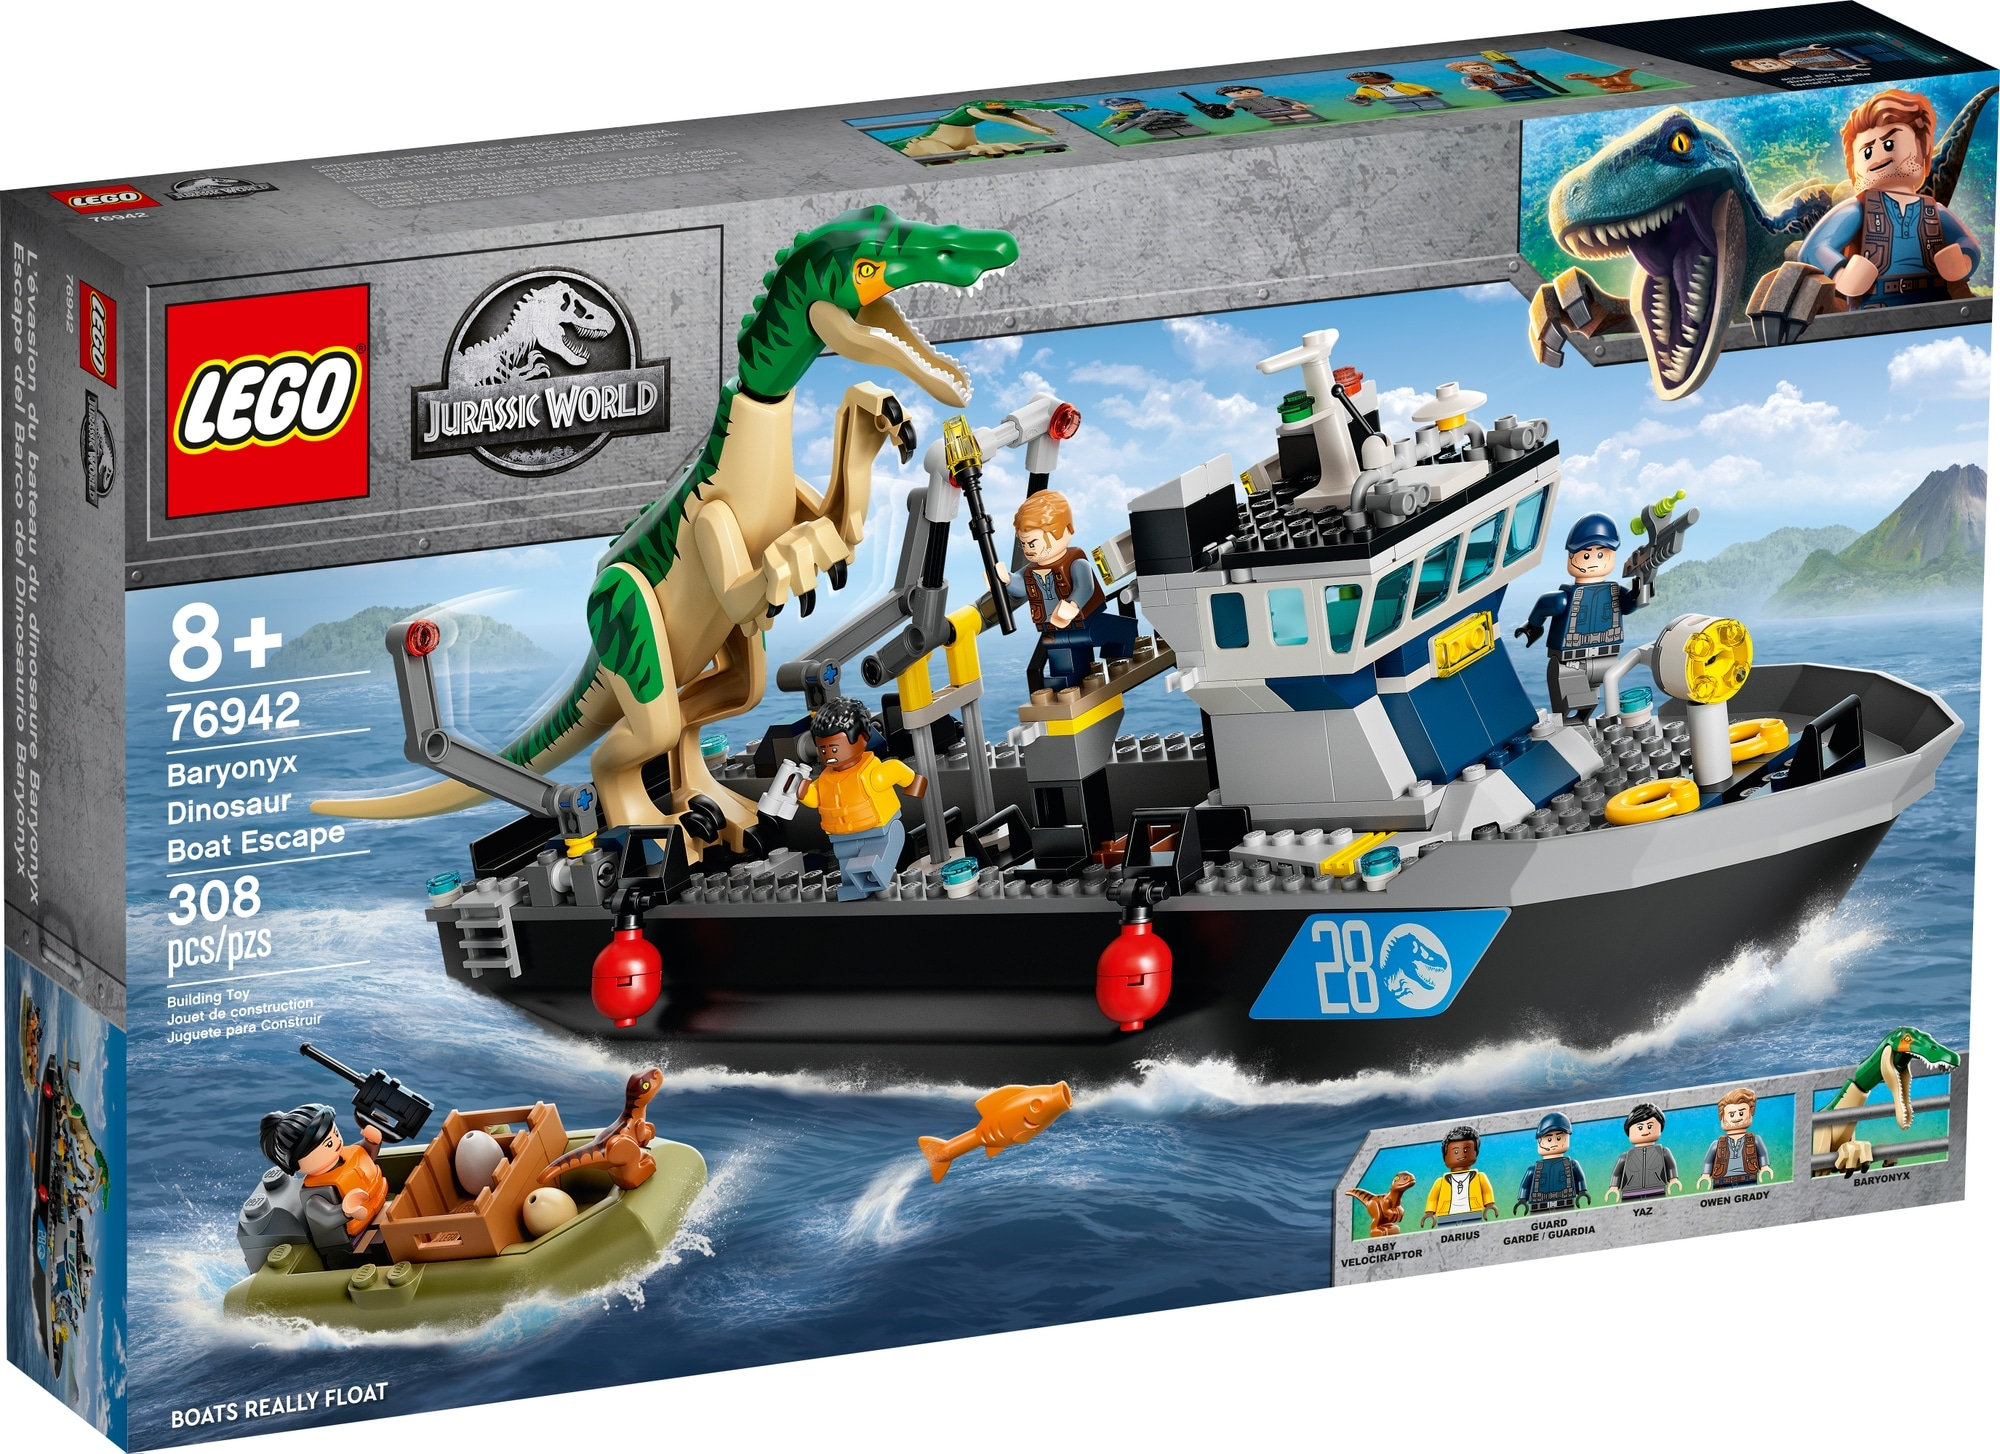 LEGO Jurassic World 76942 Flucht Des Baryonyx 2